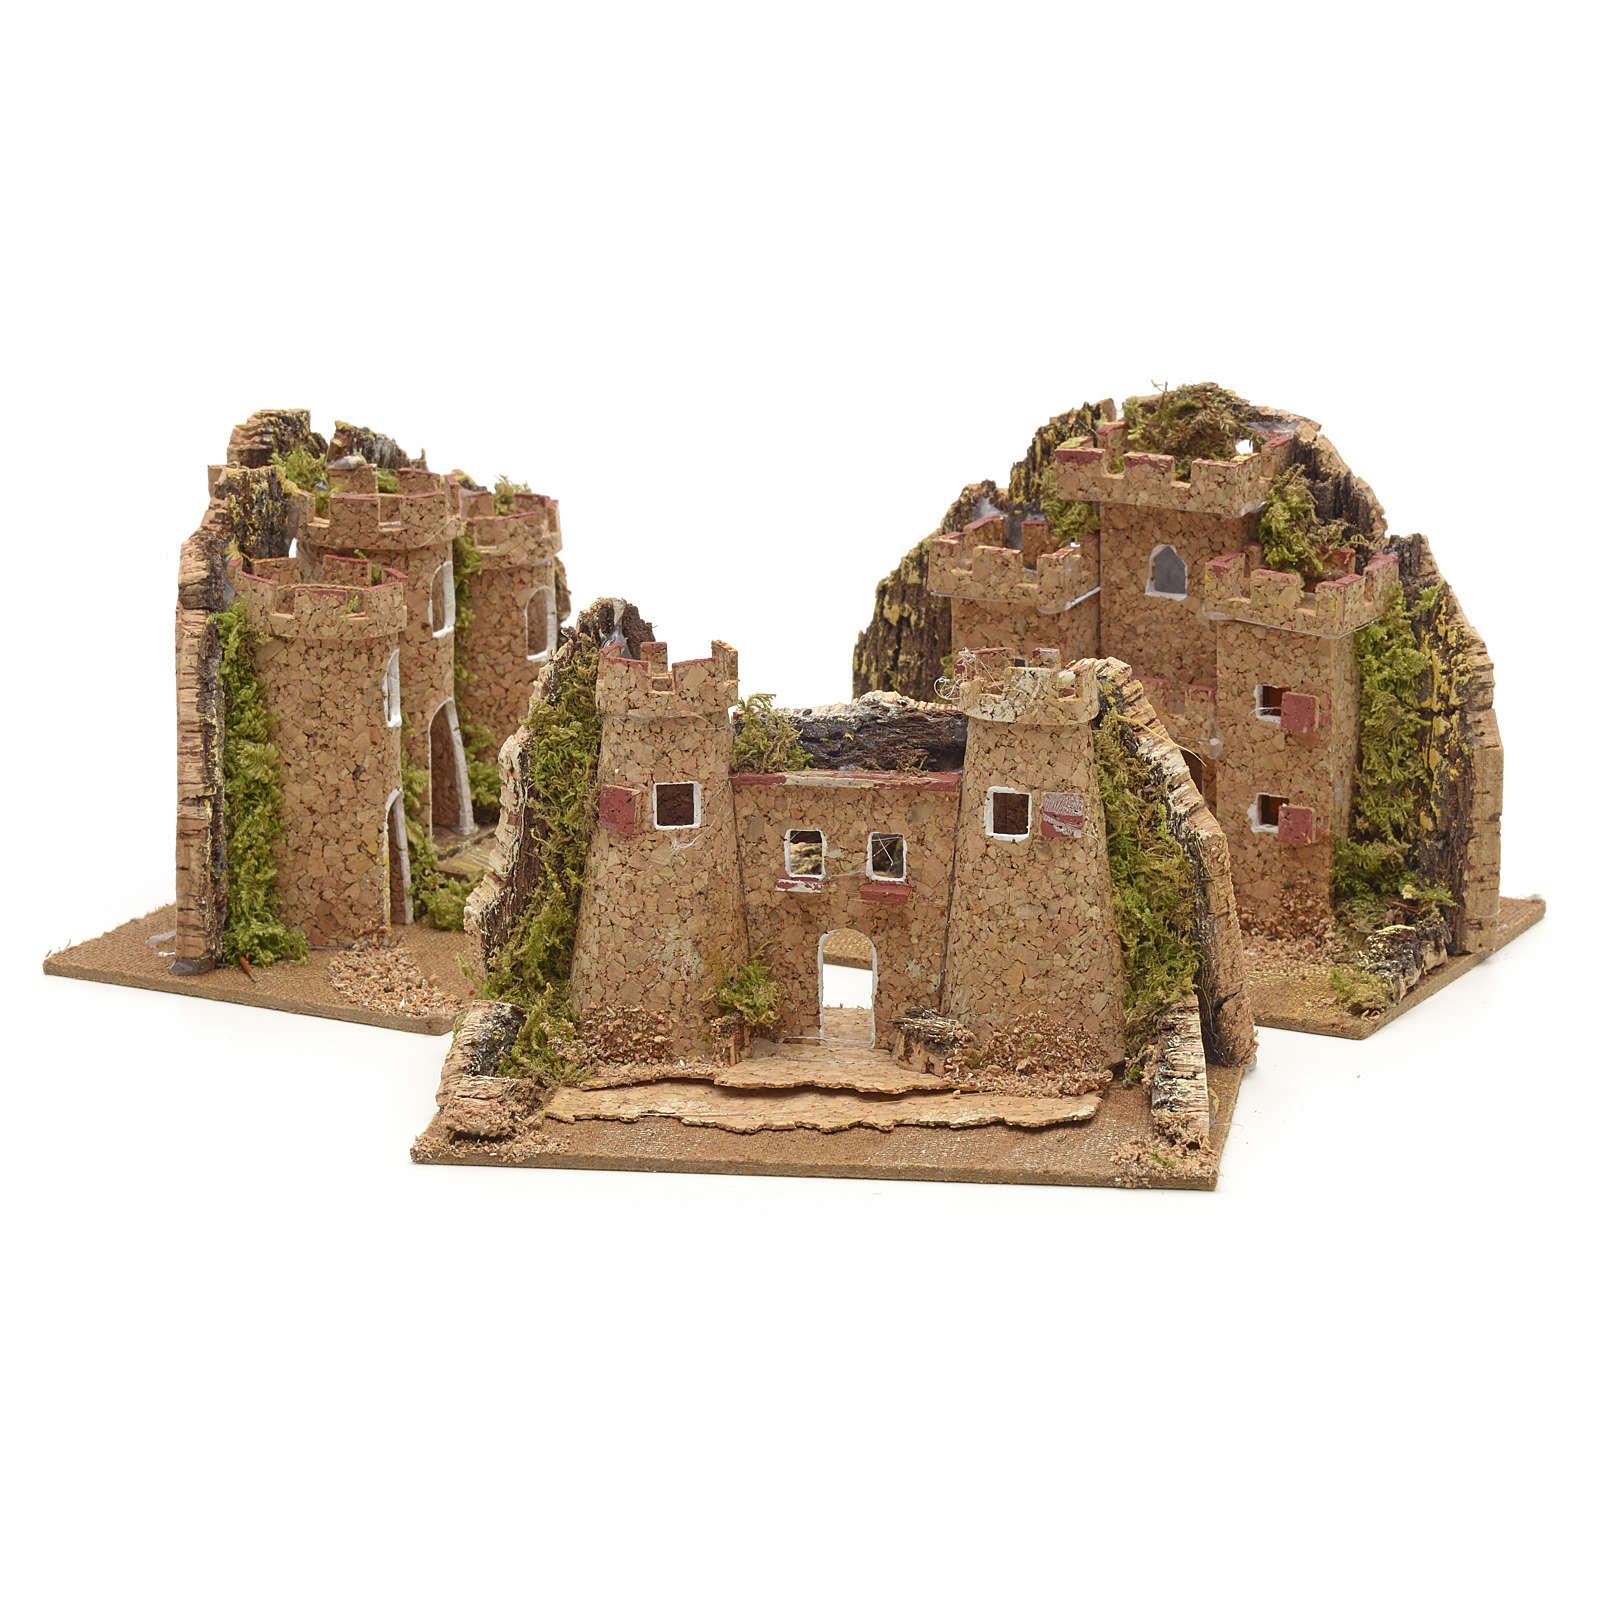 Nativity setting, castle measuring 15x10cm 4